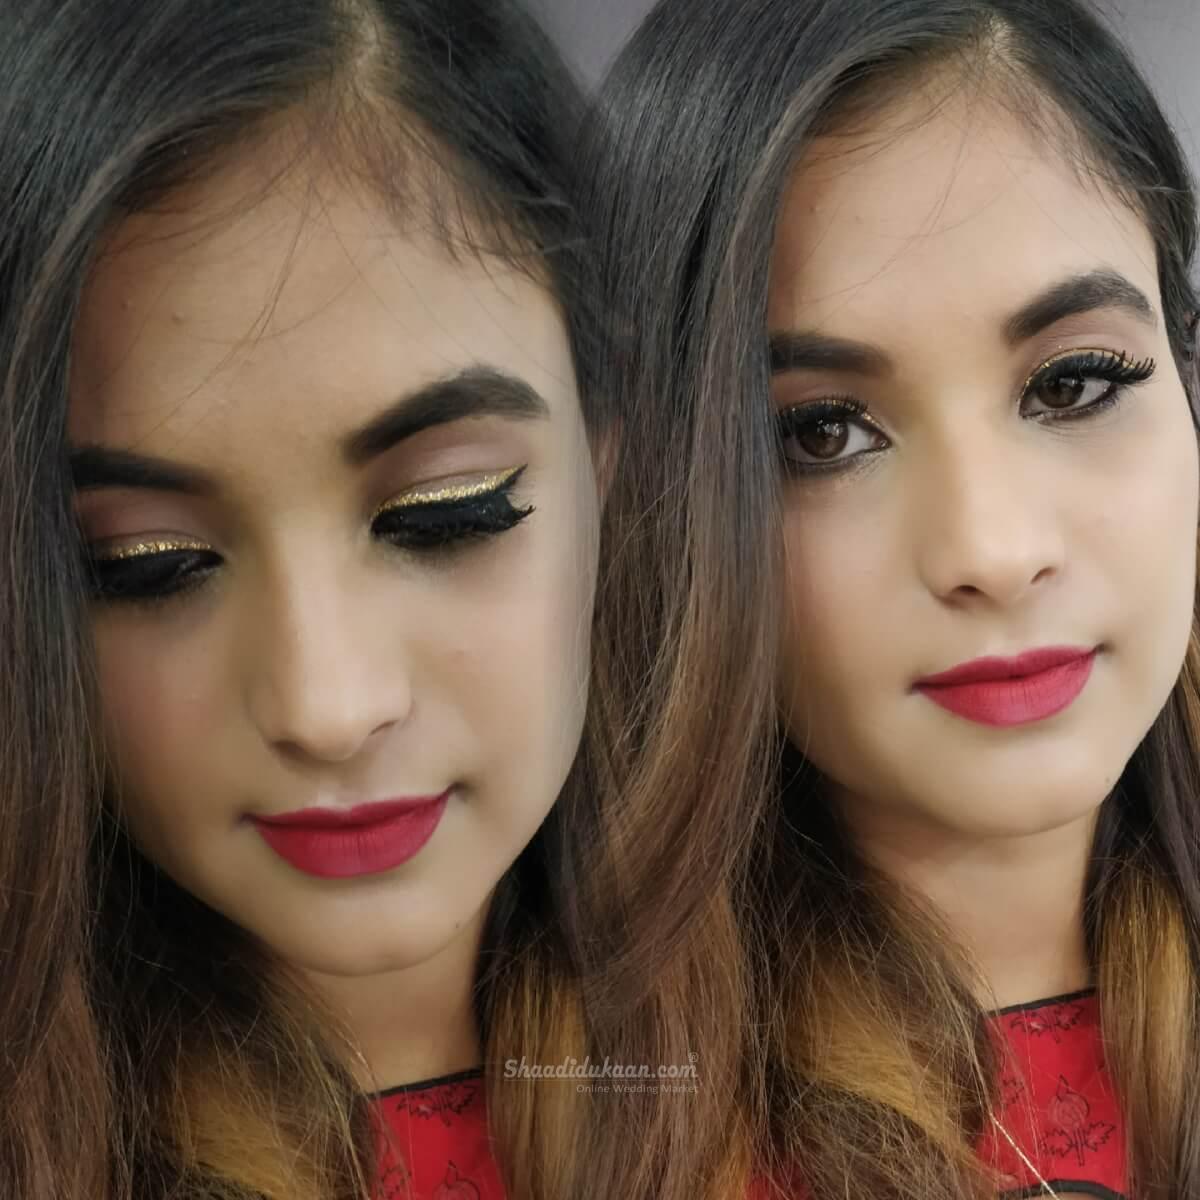 Tejashree Professional Makeup Artist